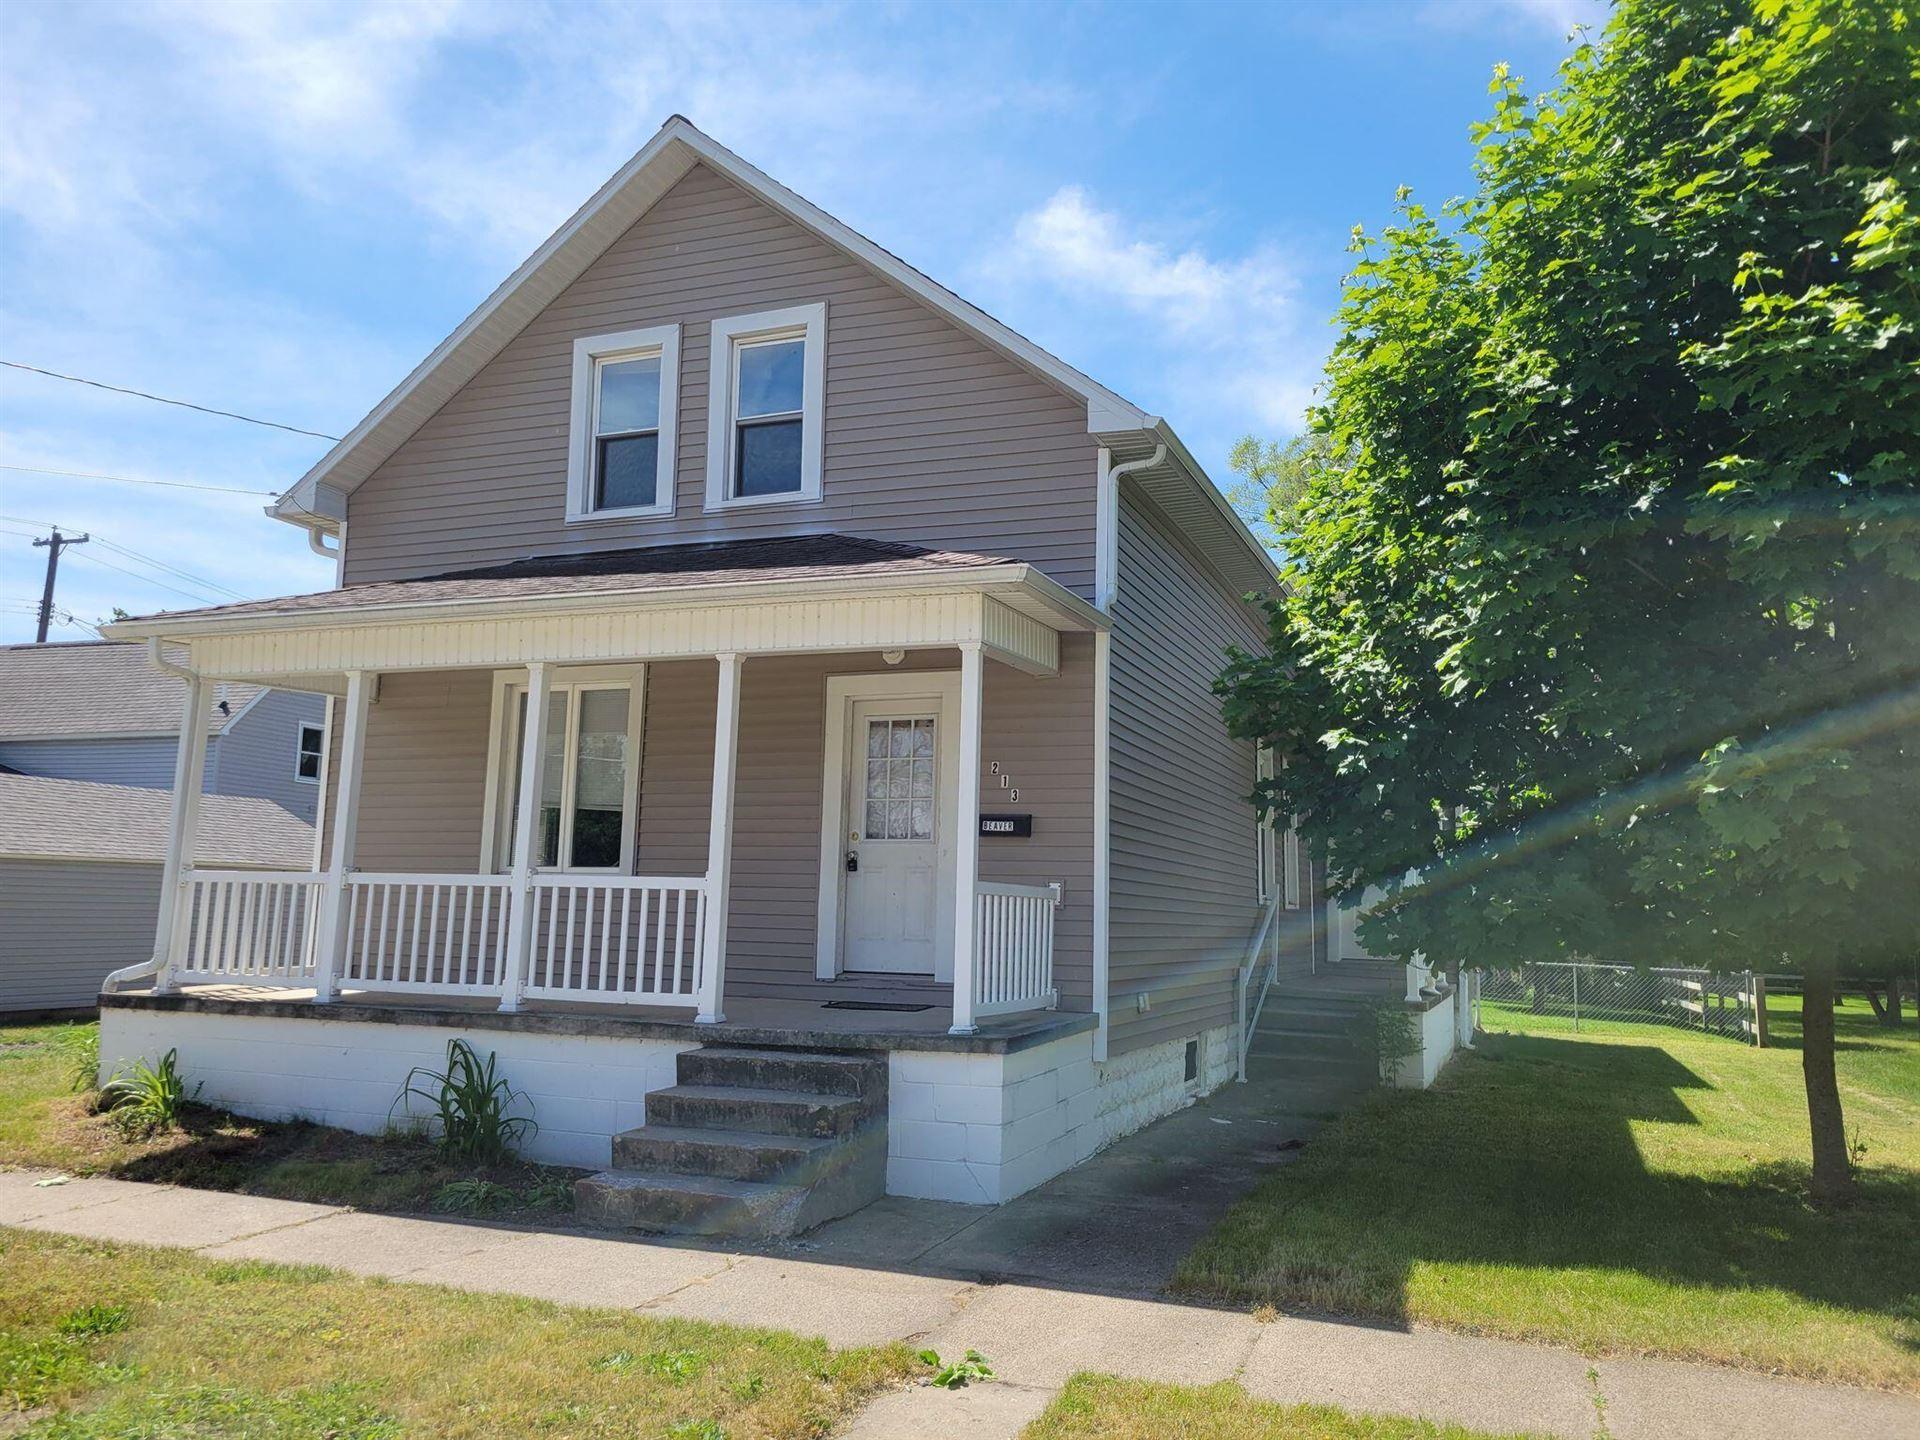 213 8th Street, Manistee, MI 49660 - MLS#: 21019978